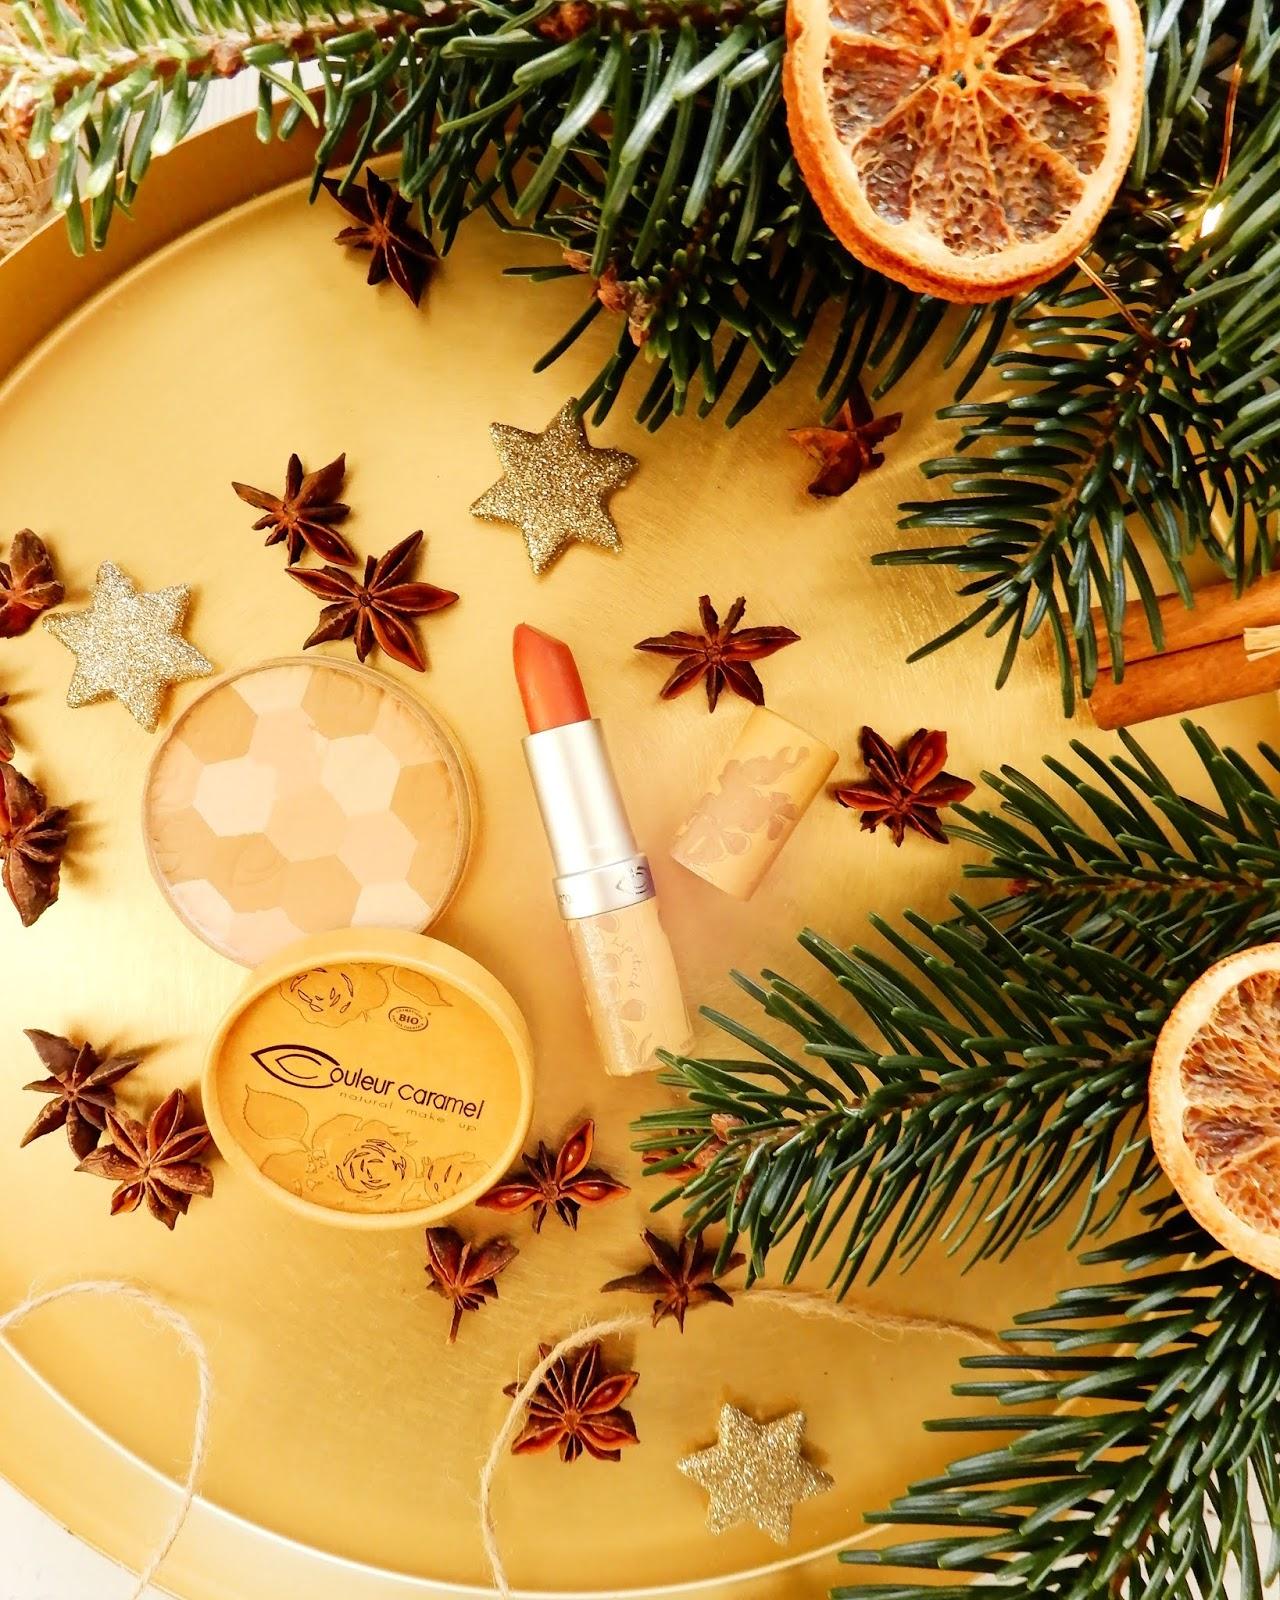 Puder Mozaika Couleur Caramel do twarzy w kolorze 232, Naturalna szminka o numerze 224 Couleur Caramel,